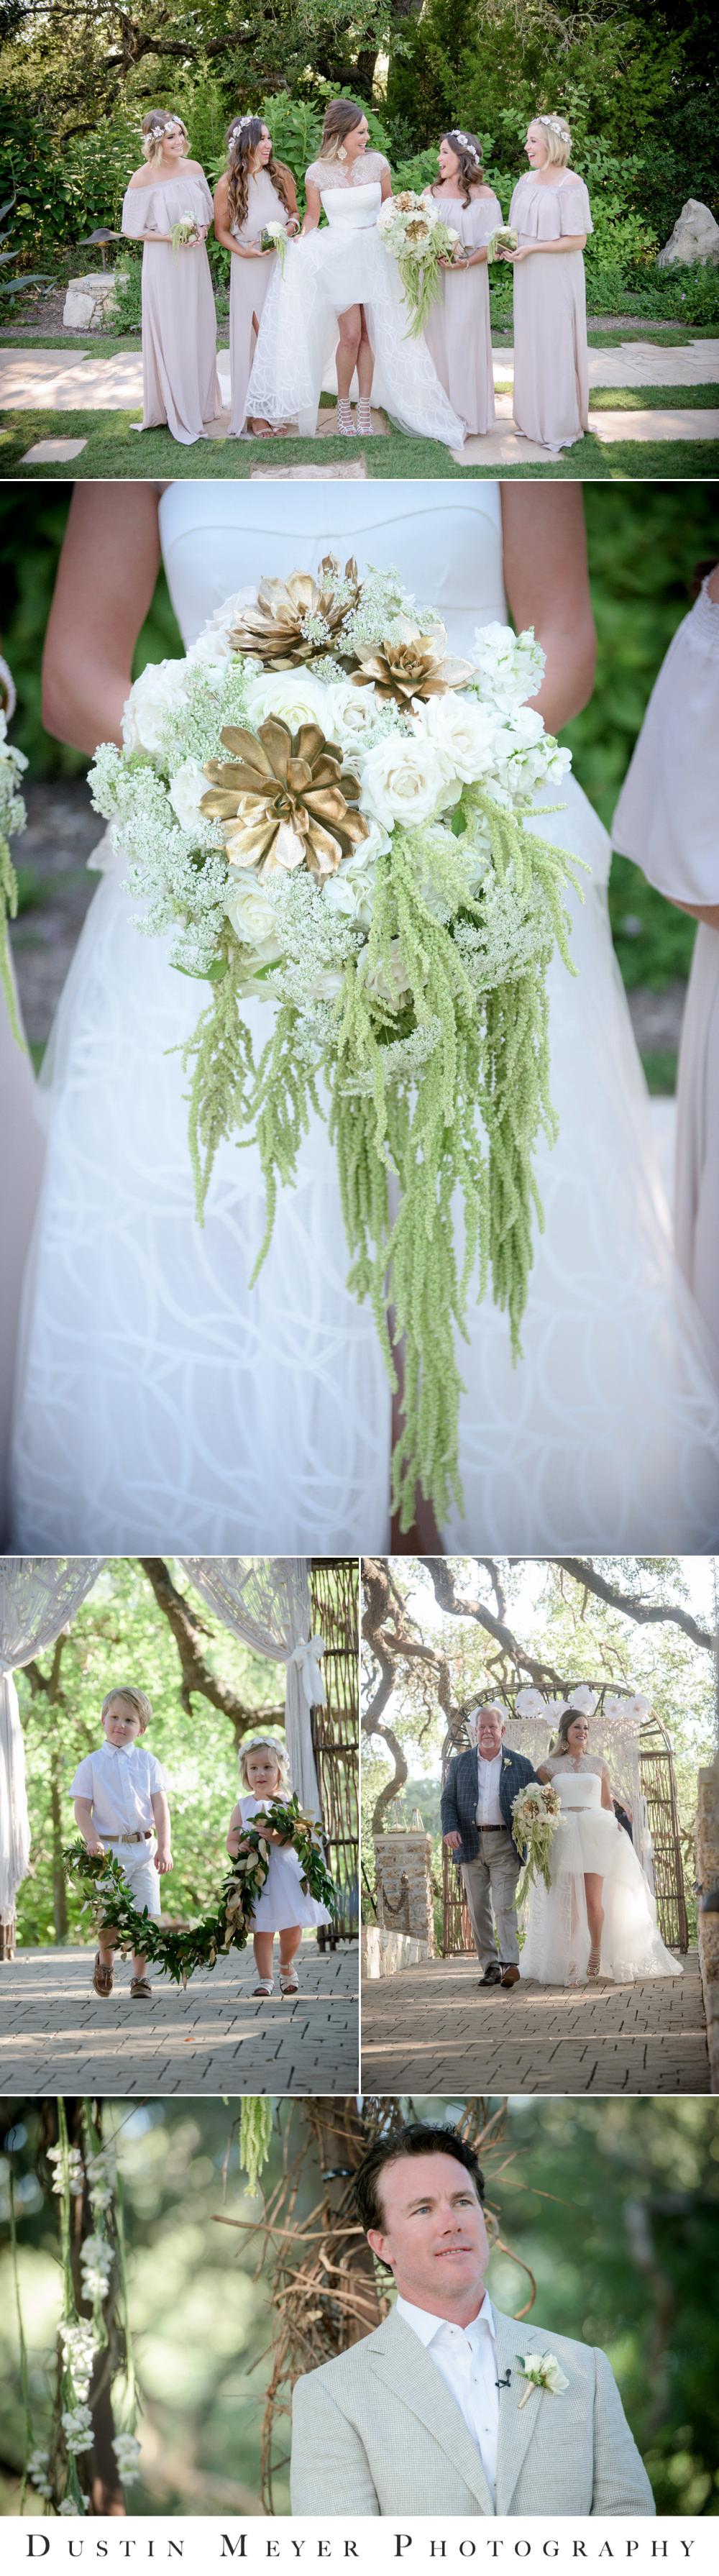 wedding bouquet, camp lucy wedding photos, sacred oaks wedding, father of the bride, groomsmen attire, flower girl dresses,